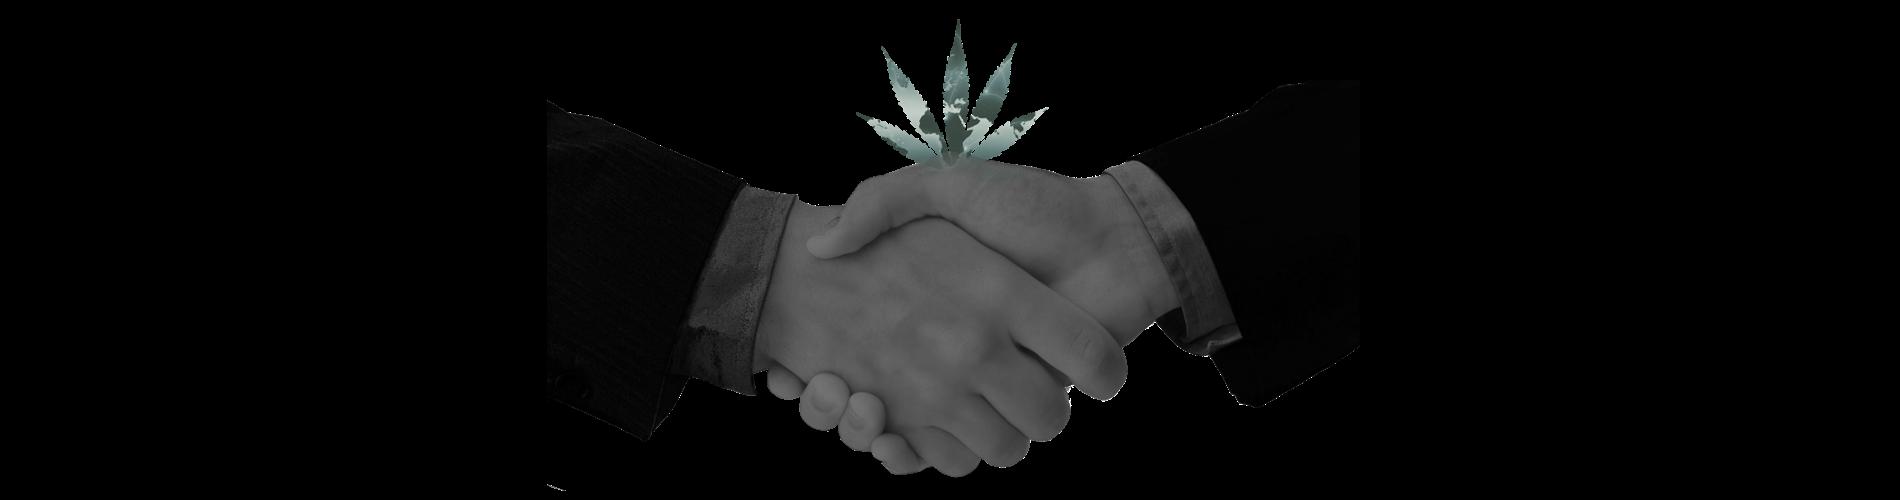 cannabis_image_slider